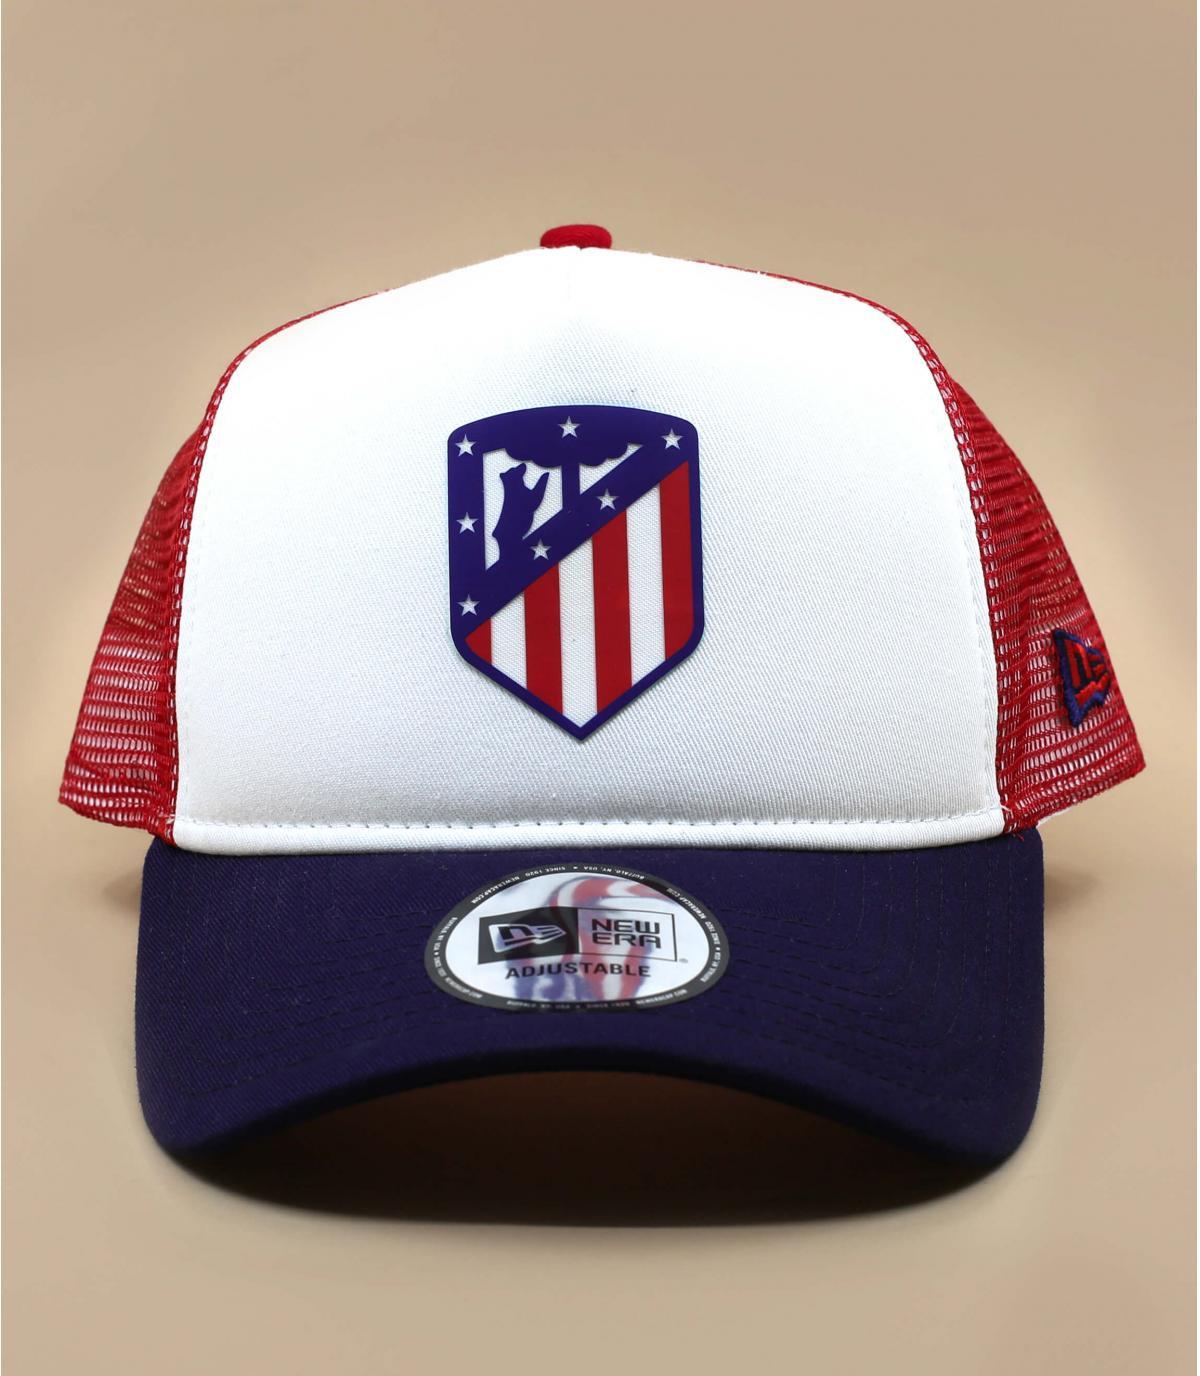 Details Trucker Atletico Madrid - afbeeling 2